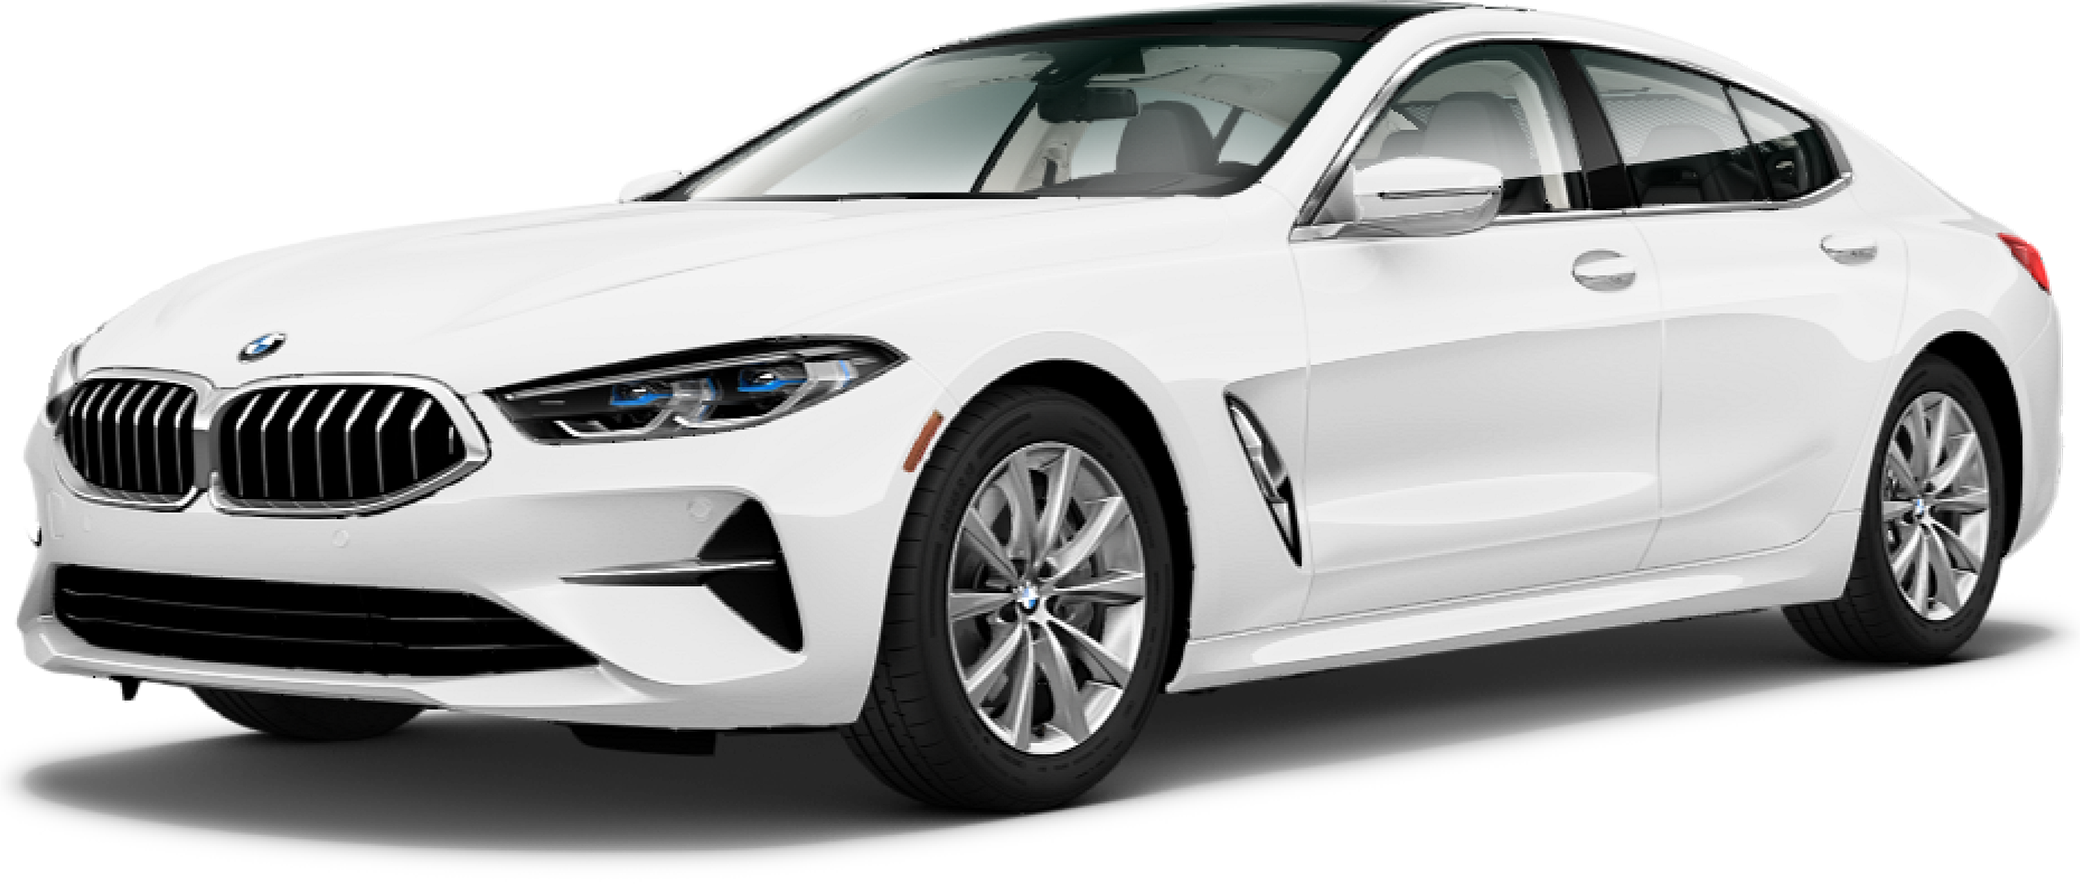 2020 BMW M850i Incentives, Specials & Offers in Wichita Falls TX